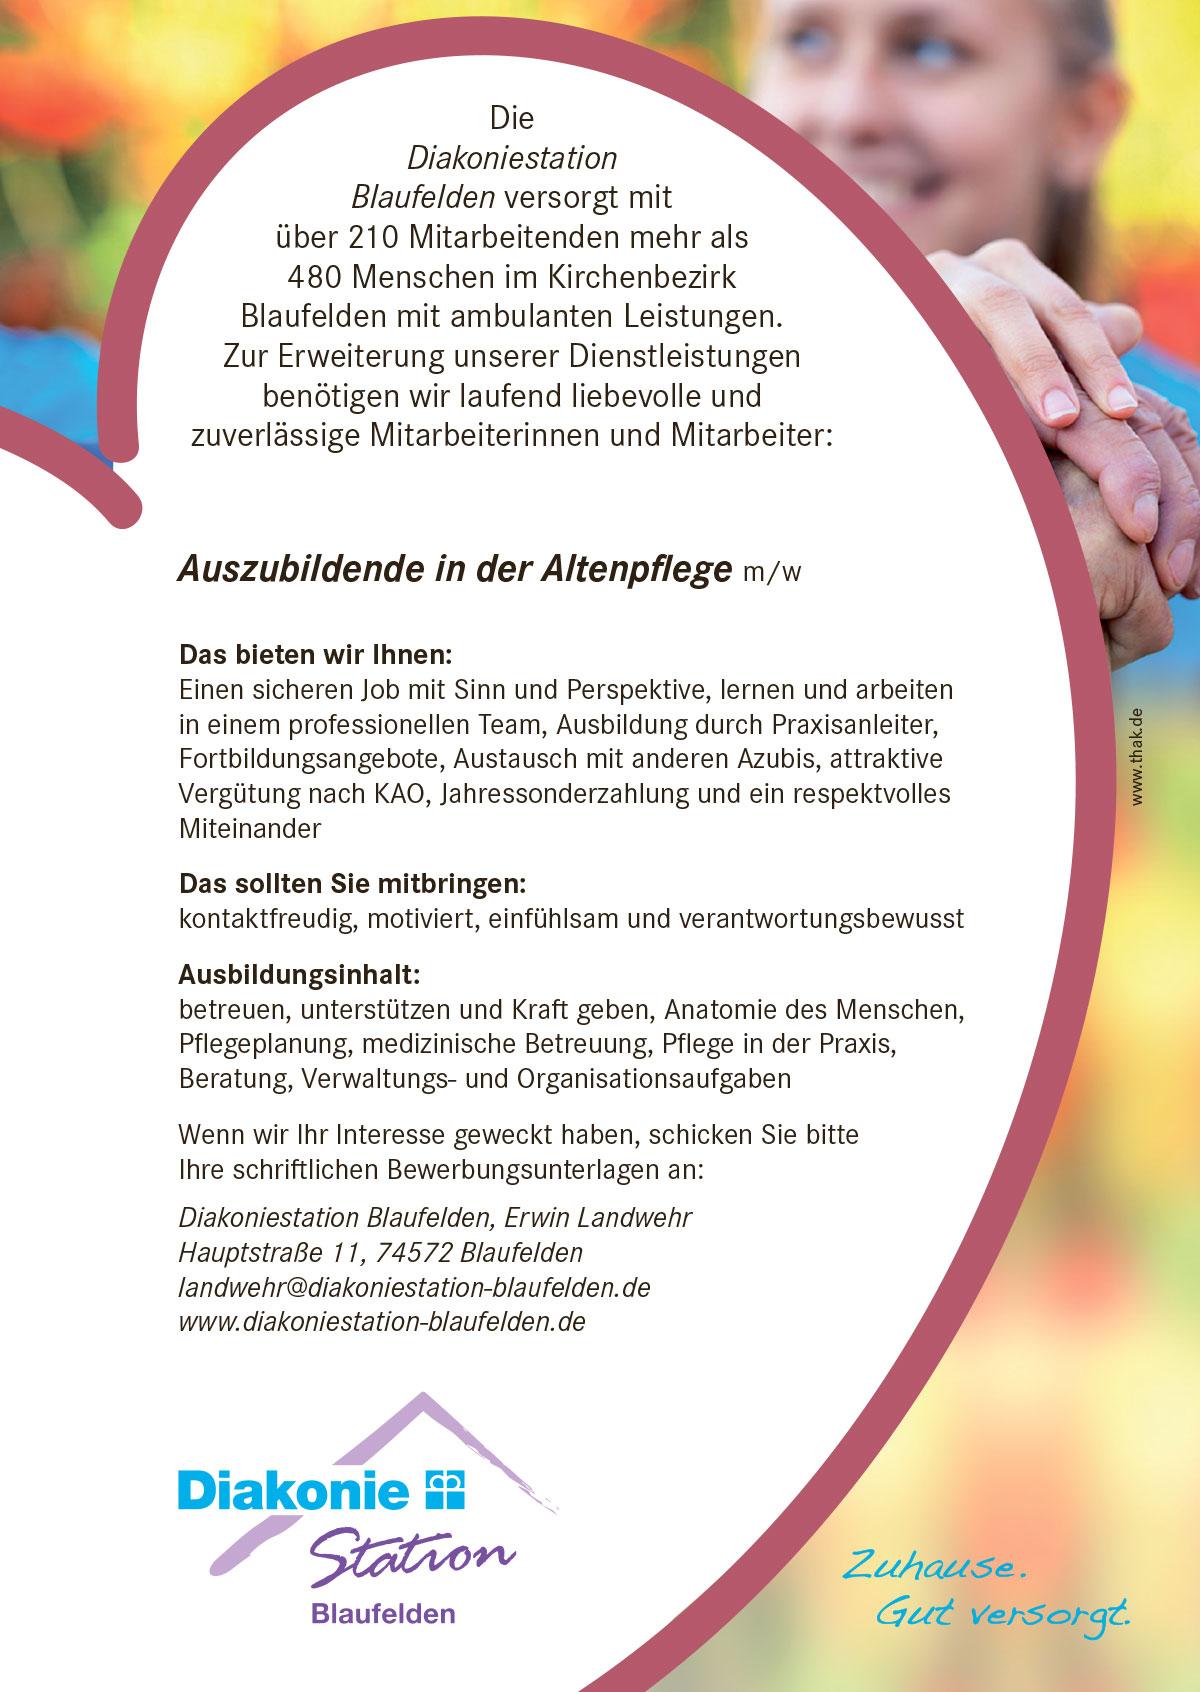 Diakoniestation sucht Azubis – ebbes aus Hohenlohe